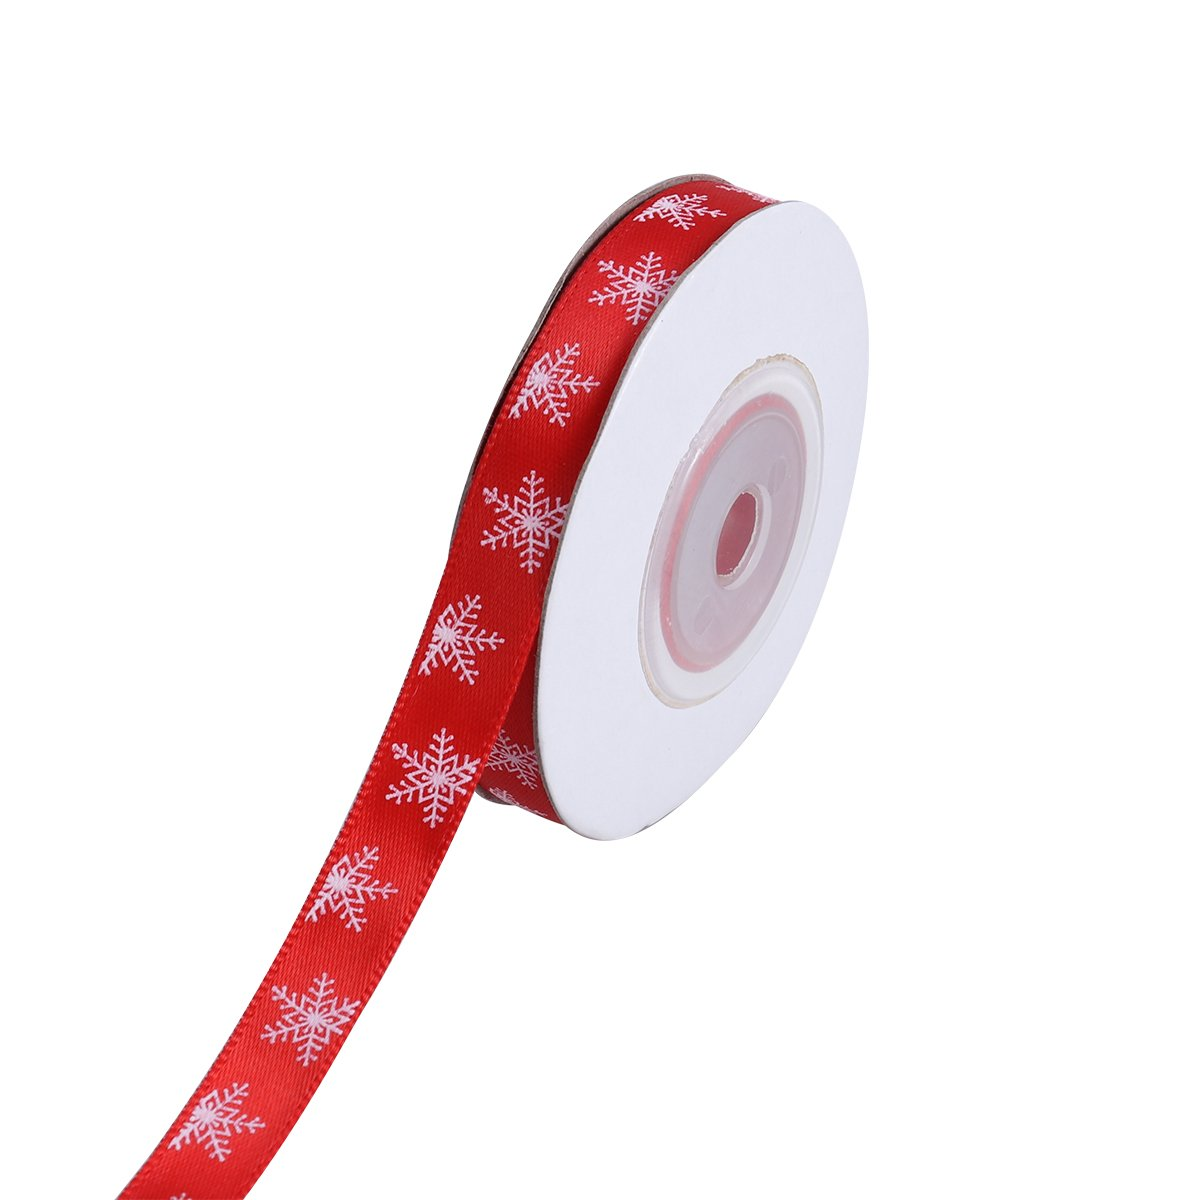 Tinksky Christmas Satin Ribbon, Geschenkpapier Streifen Grosgrain ...